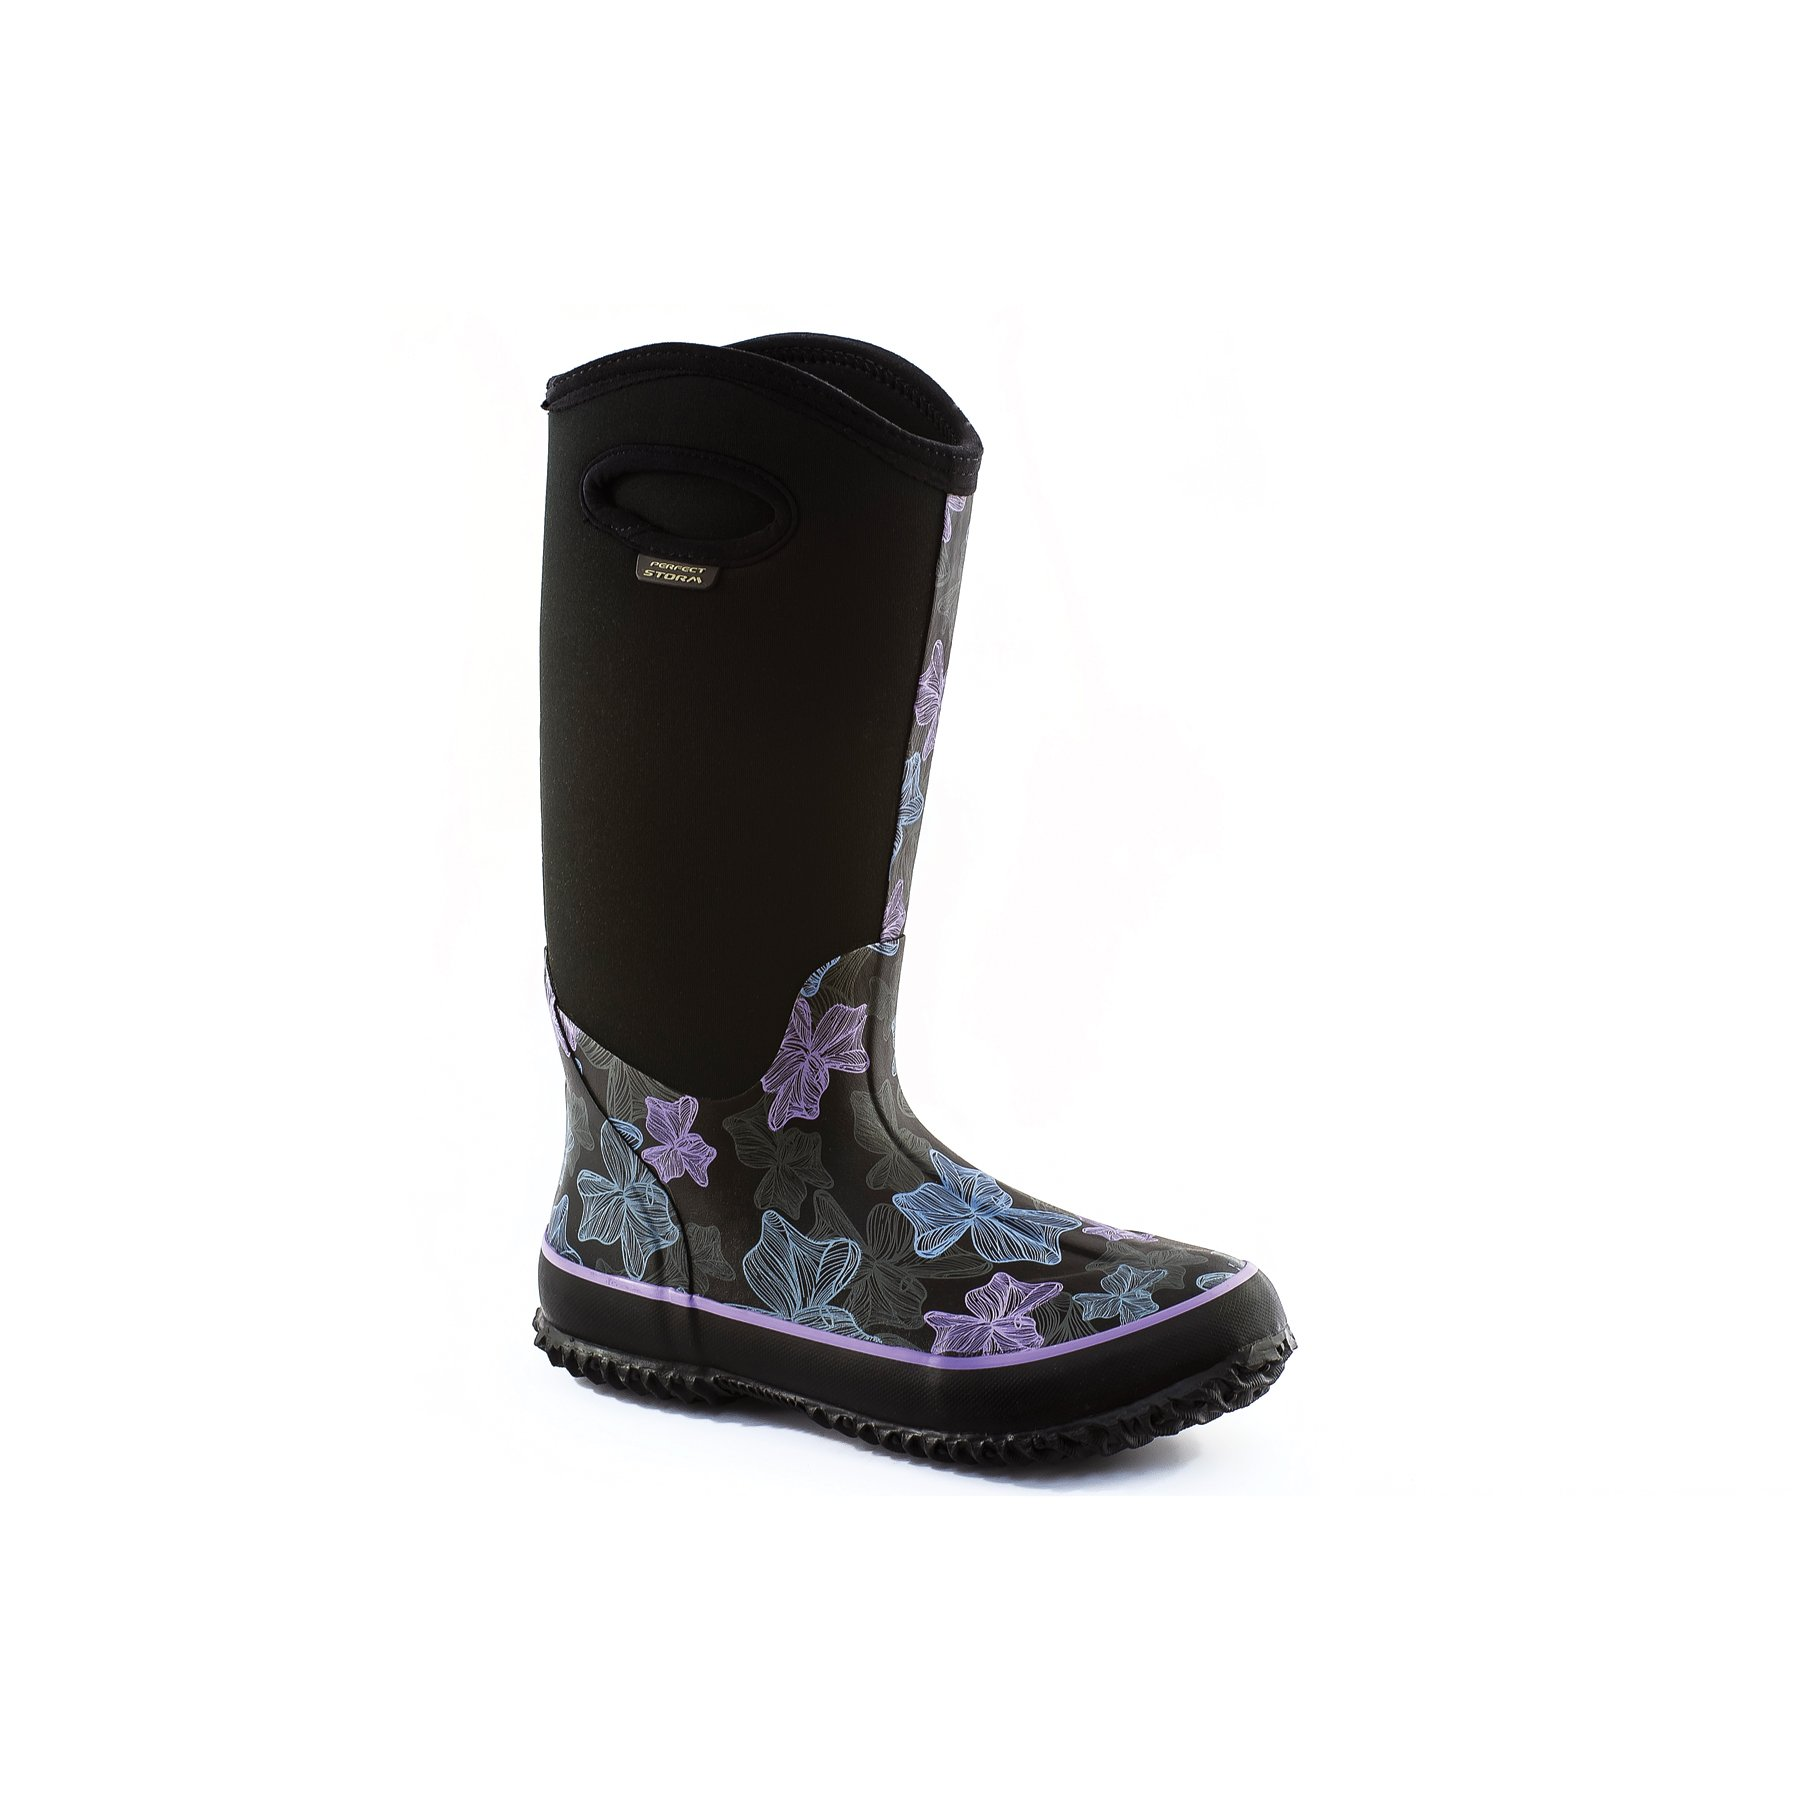 Perfect Storm Womens Cloud HIGH PASTELEGANCE Boot, Black/Purple, 11